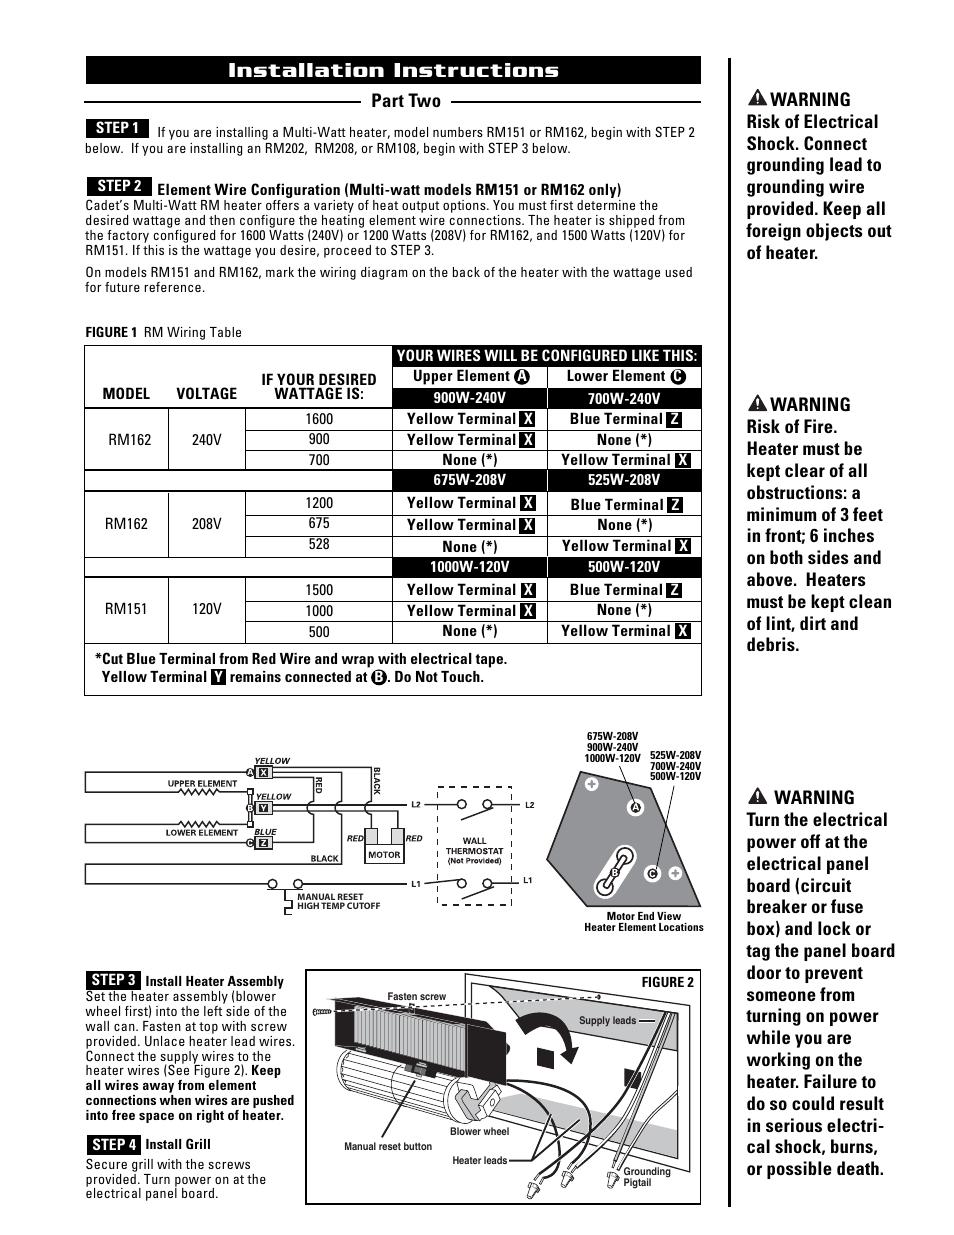 installation instructions cadet the register plus rm108 cub cadet 149 wiring diagram cadet heater wiring diagram